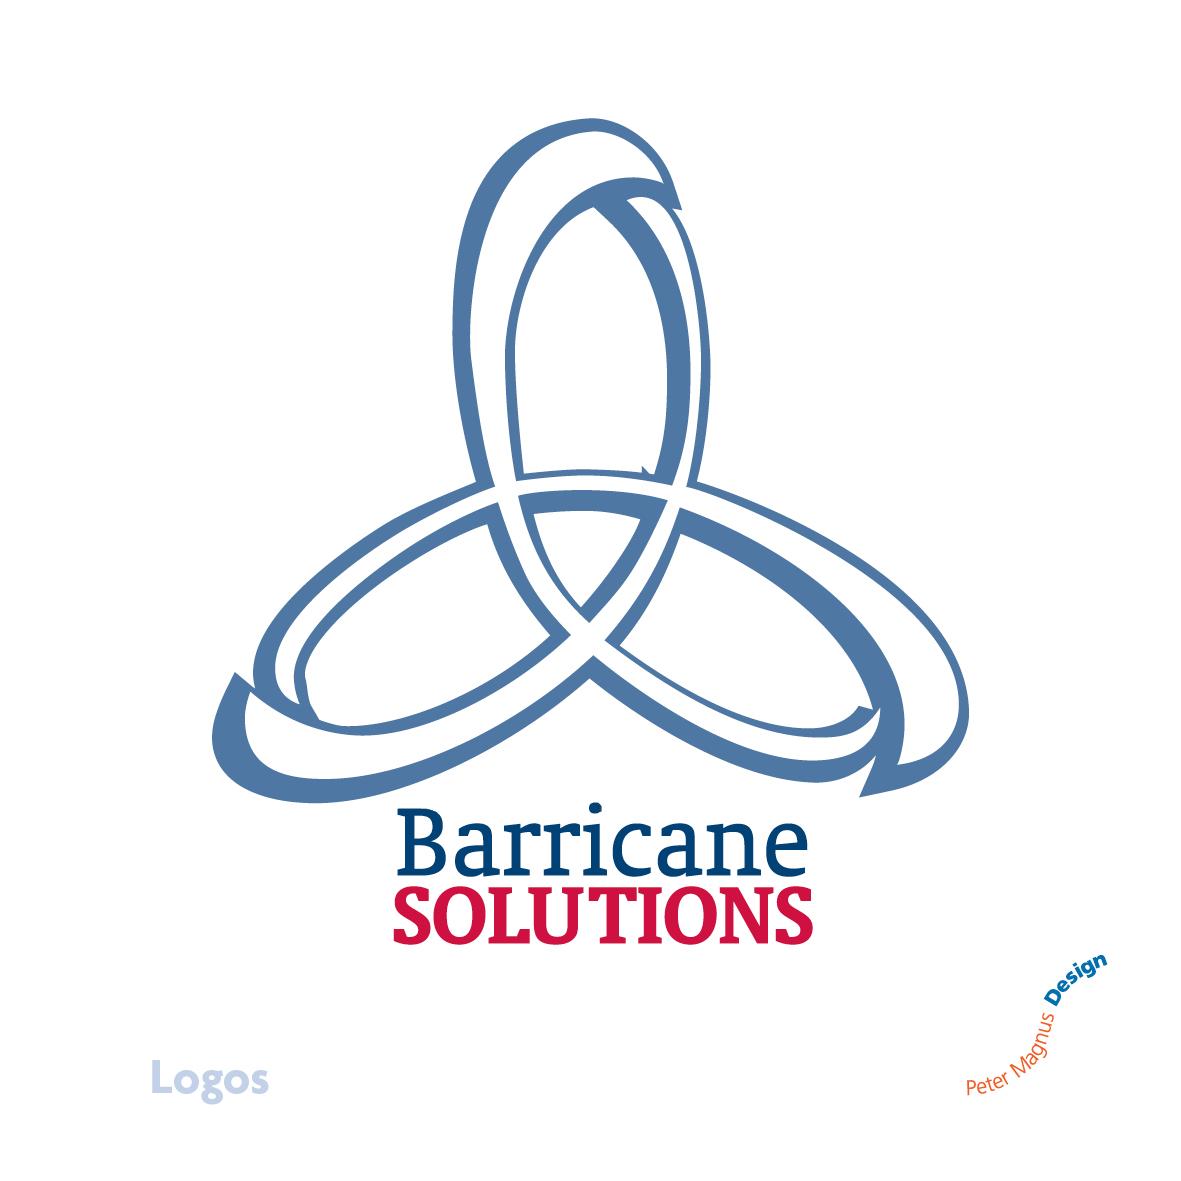 Barricane Solutions logo, logistics company